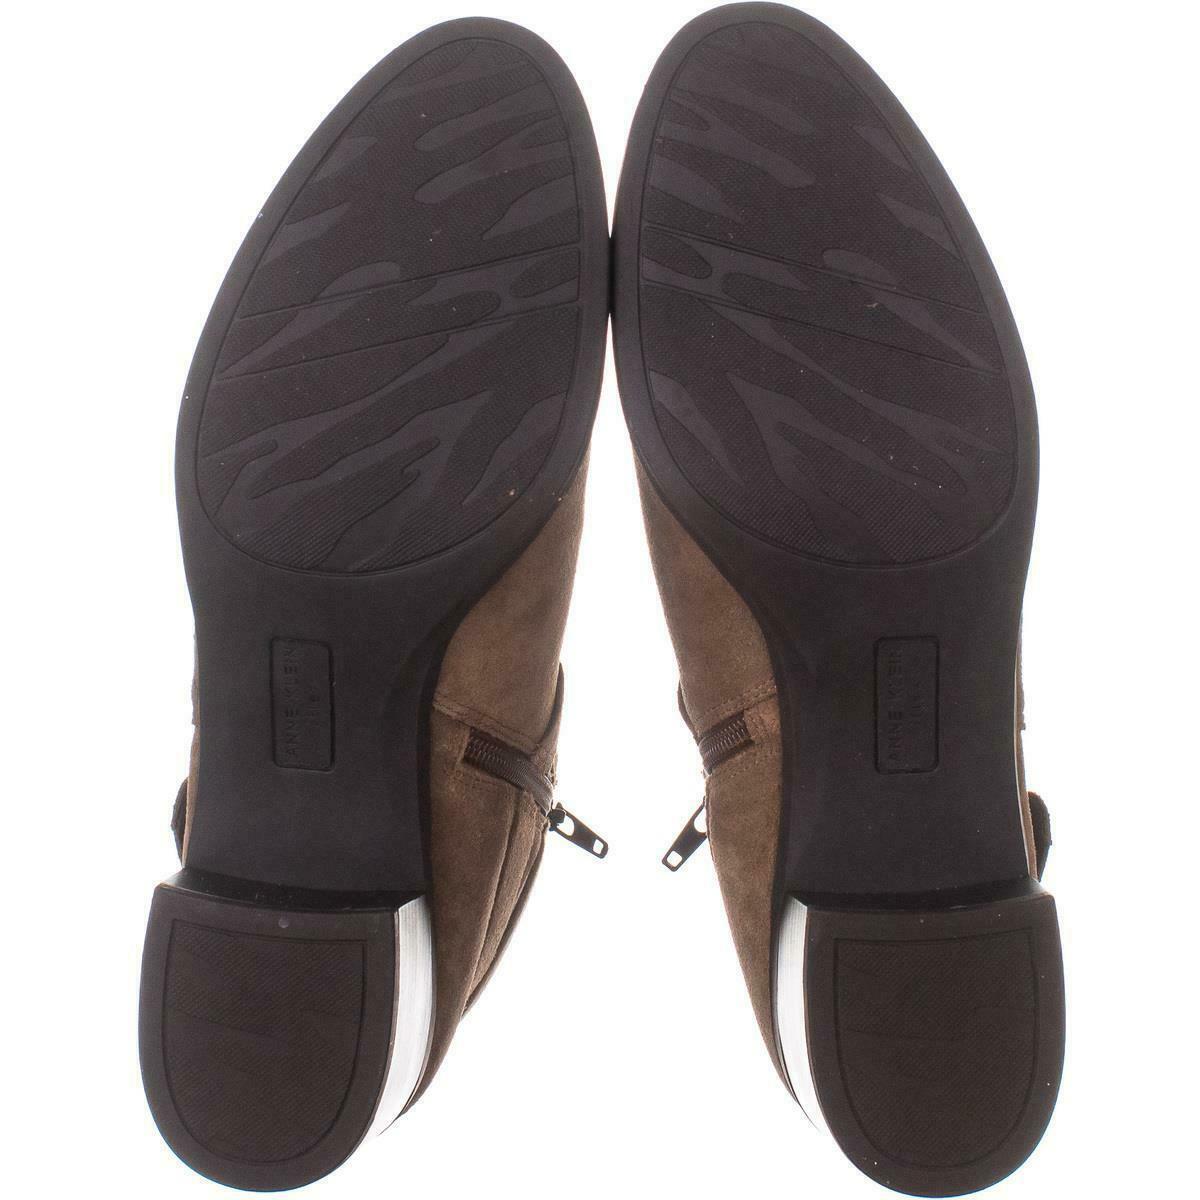 anne klein javen bottines talon bloc 479 marron 10 us boots. Black Bedroom Furniture Sets. Home Design Ideas